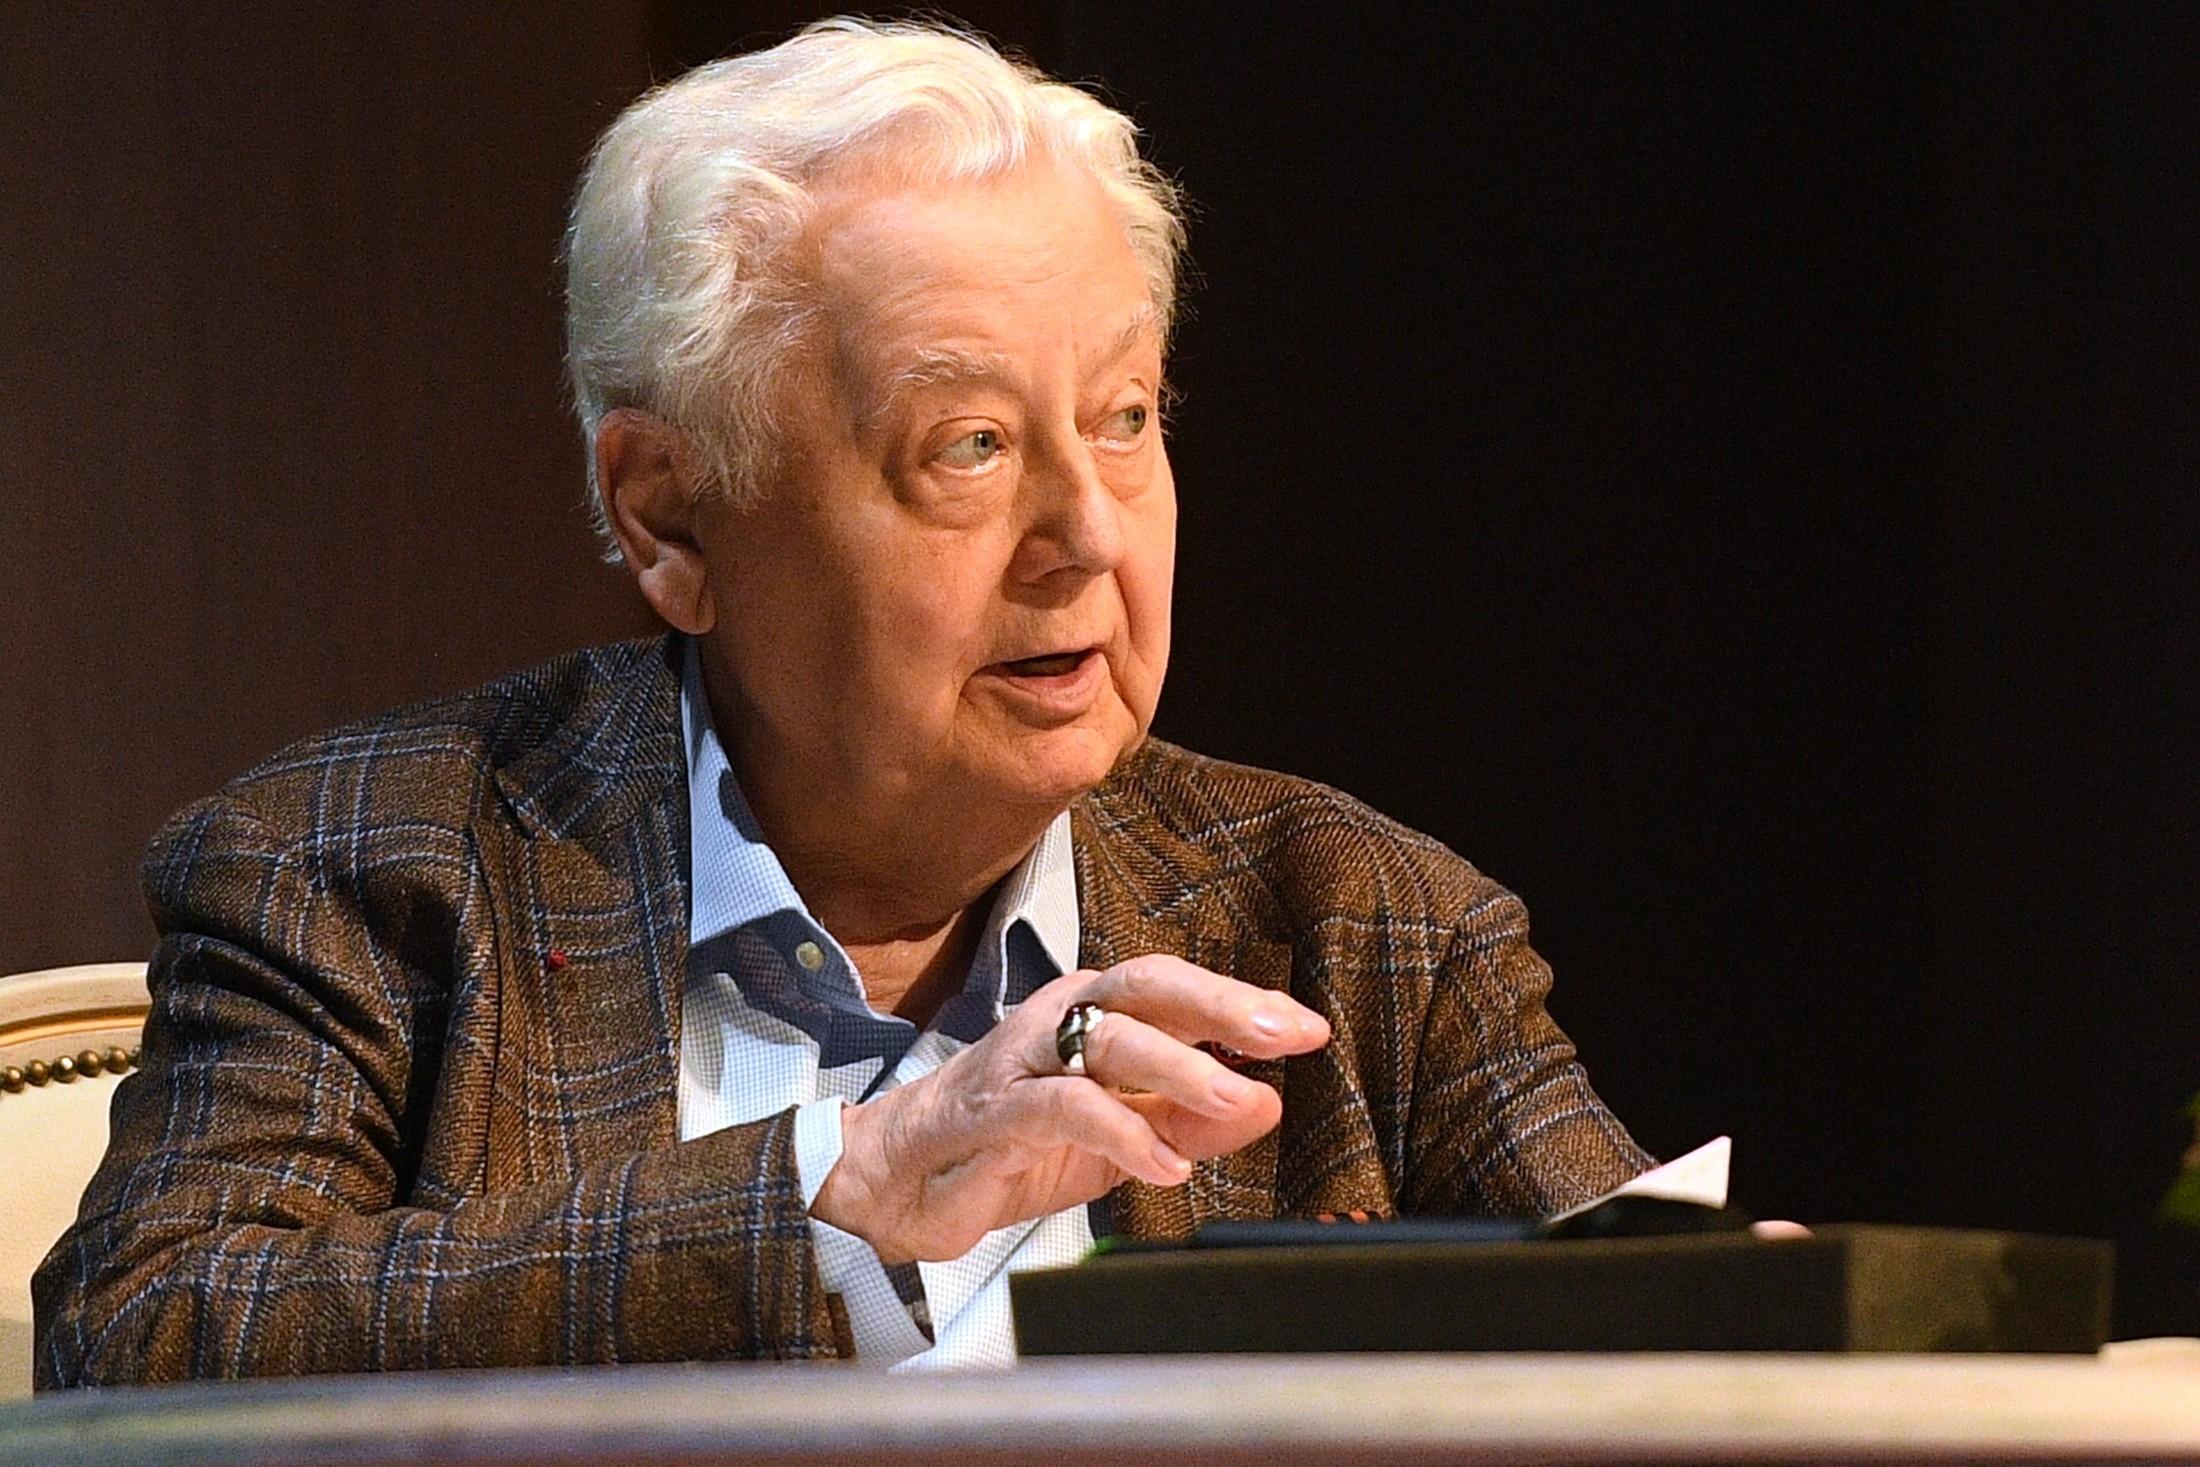 <p>Олег Табаков. Фото: &copy;РИА Новости/Владимир Астапкович</p>